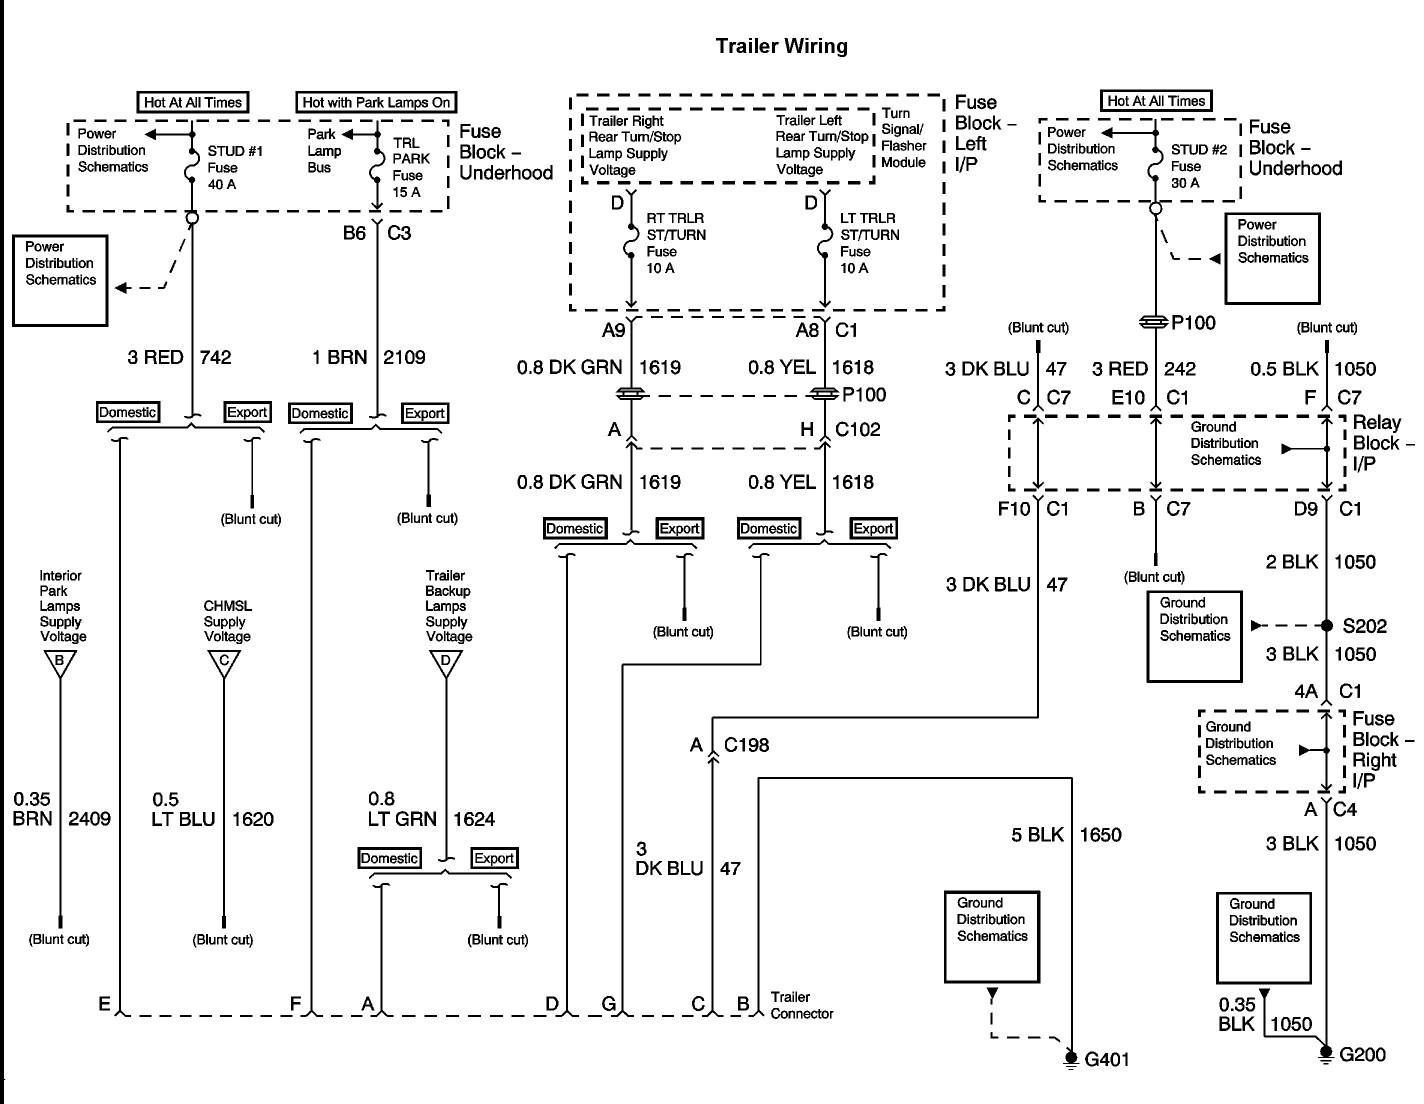 avalanche fuse diagram download wiring diagram2008 avalanche fuse diagram wiring diagram schematics